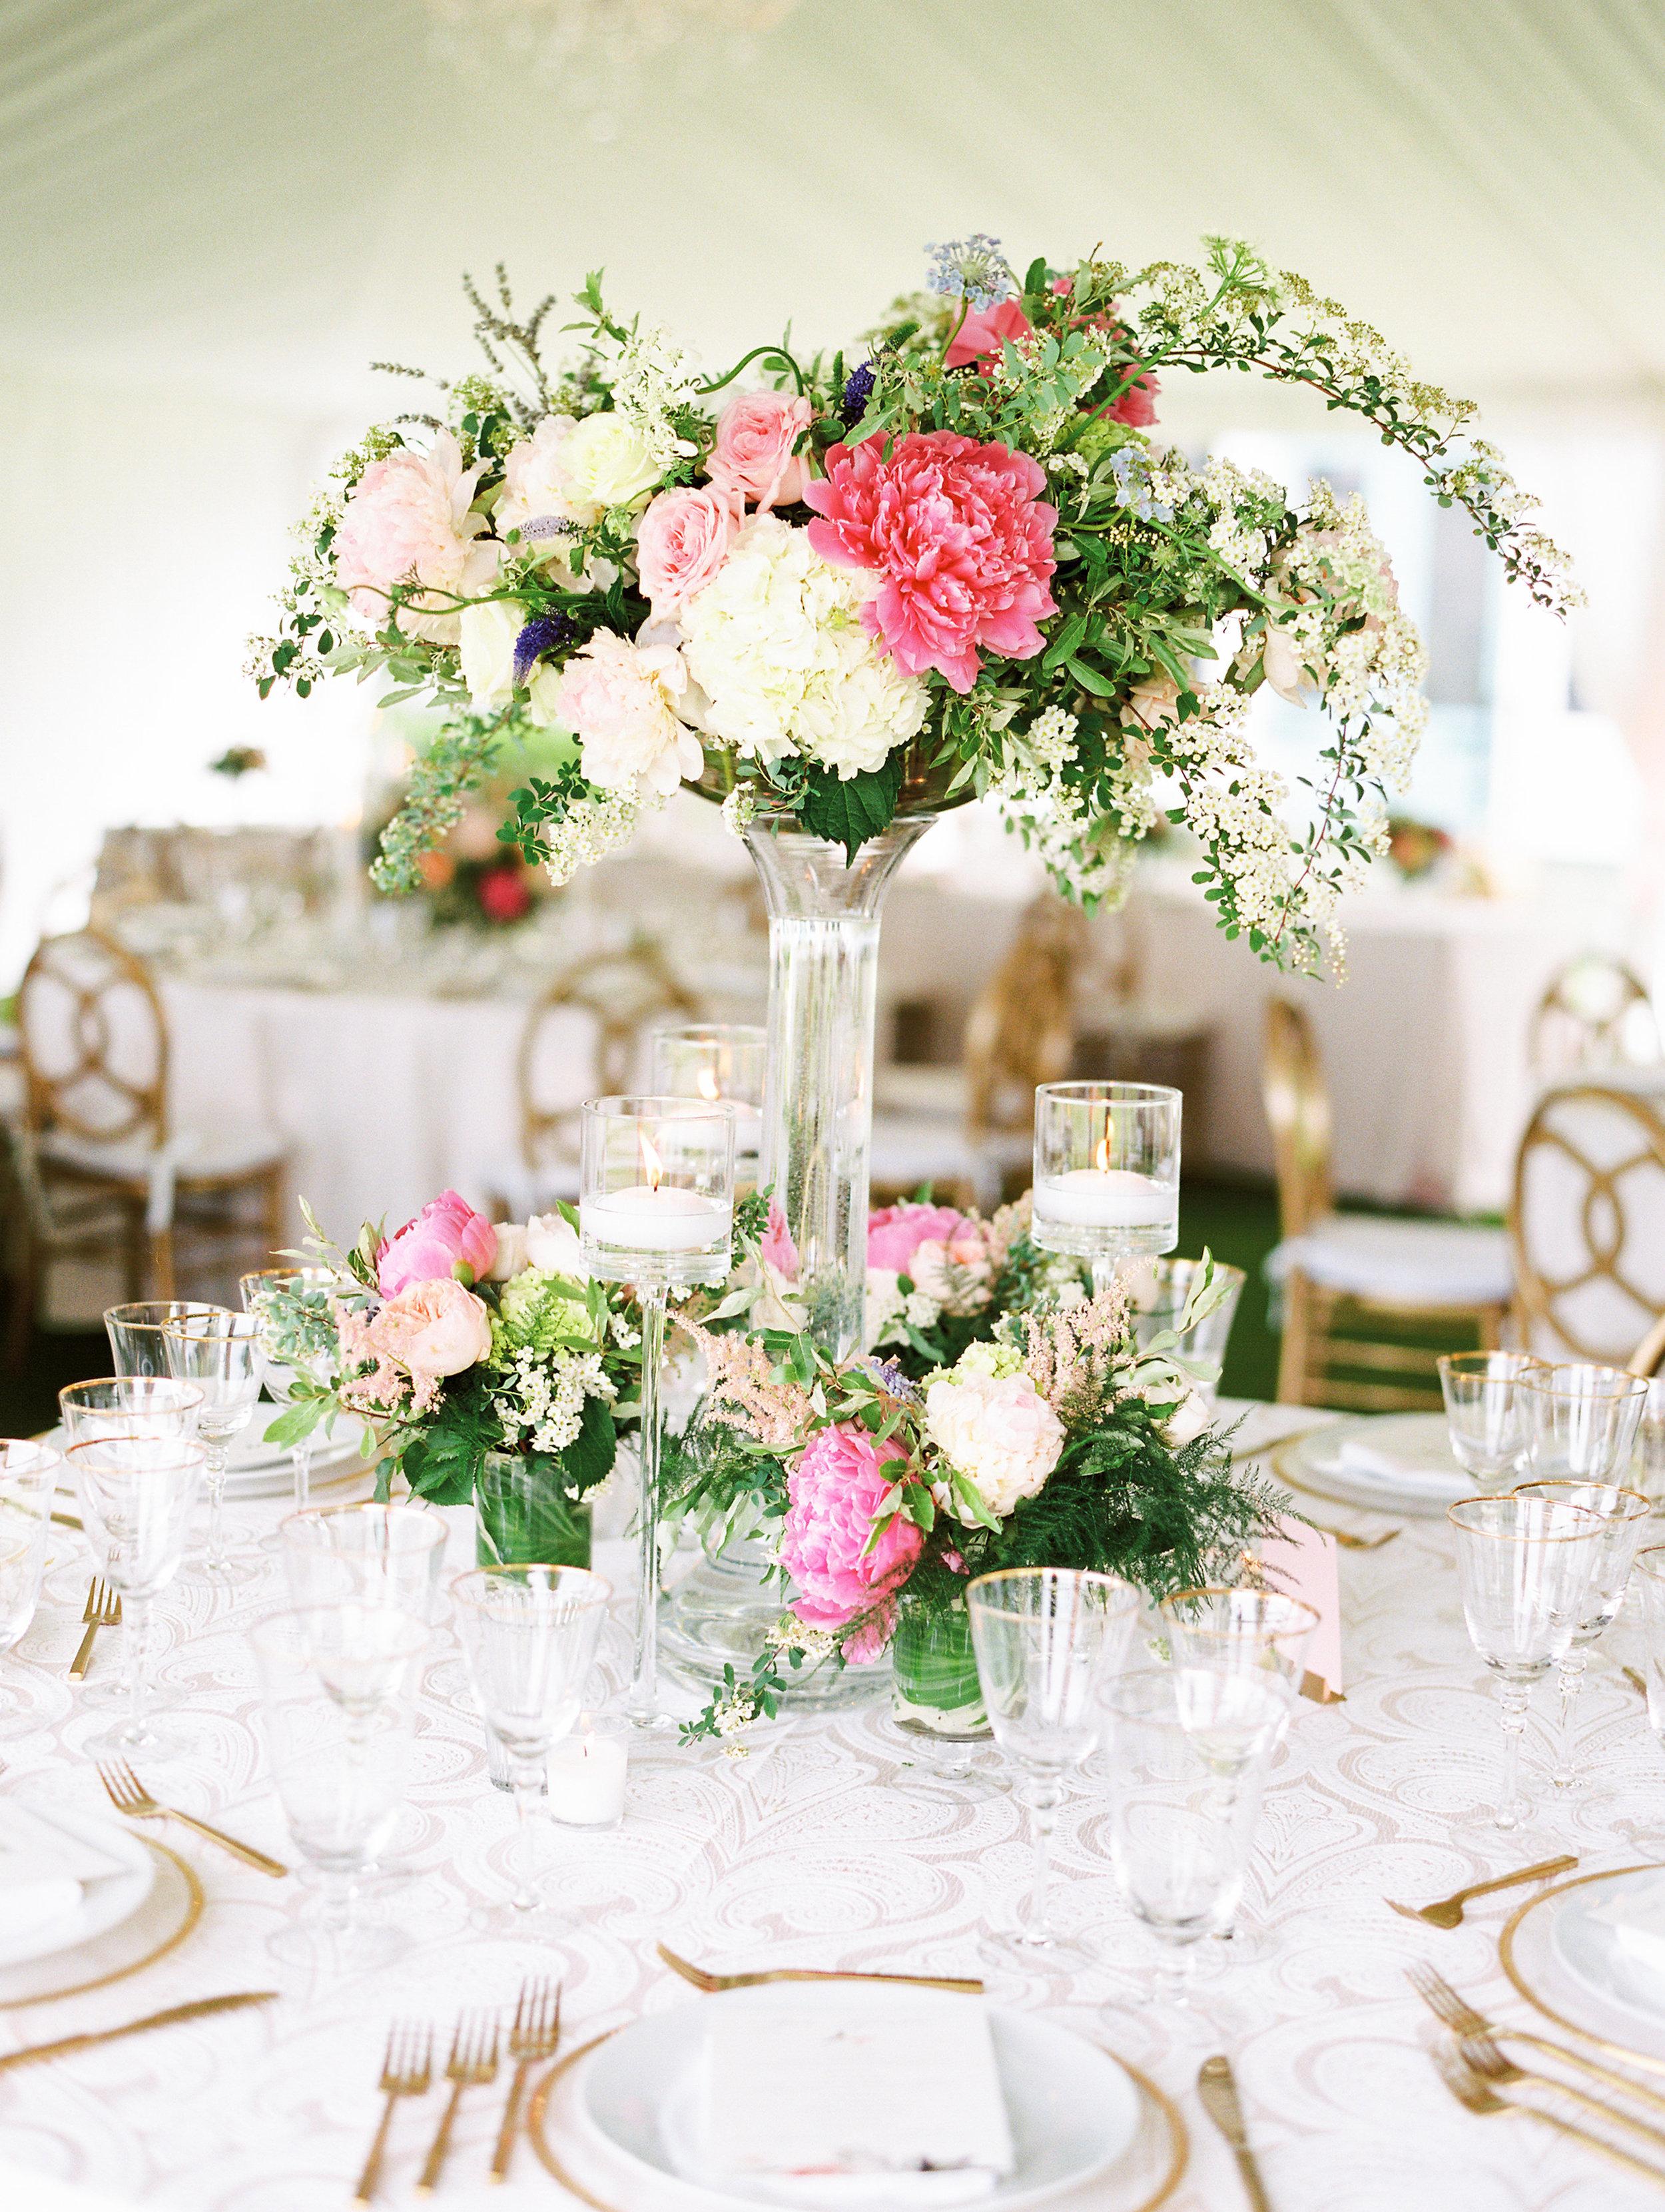 Coffman+Wedding+Reception+Details-71.jpg